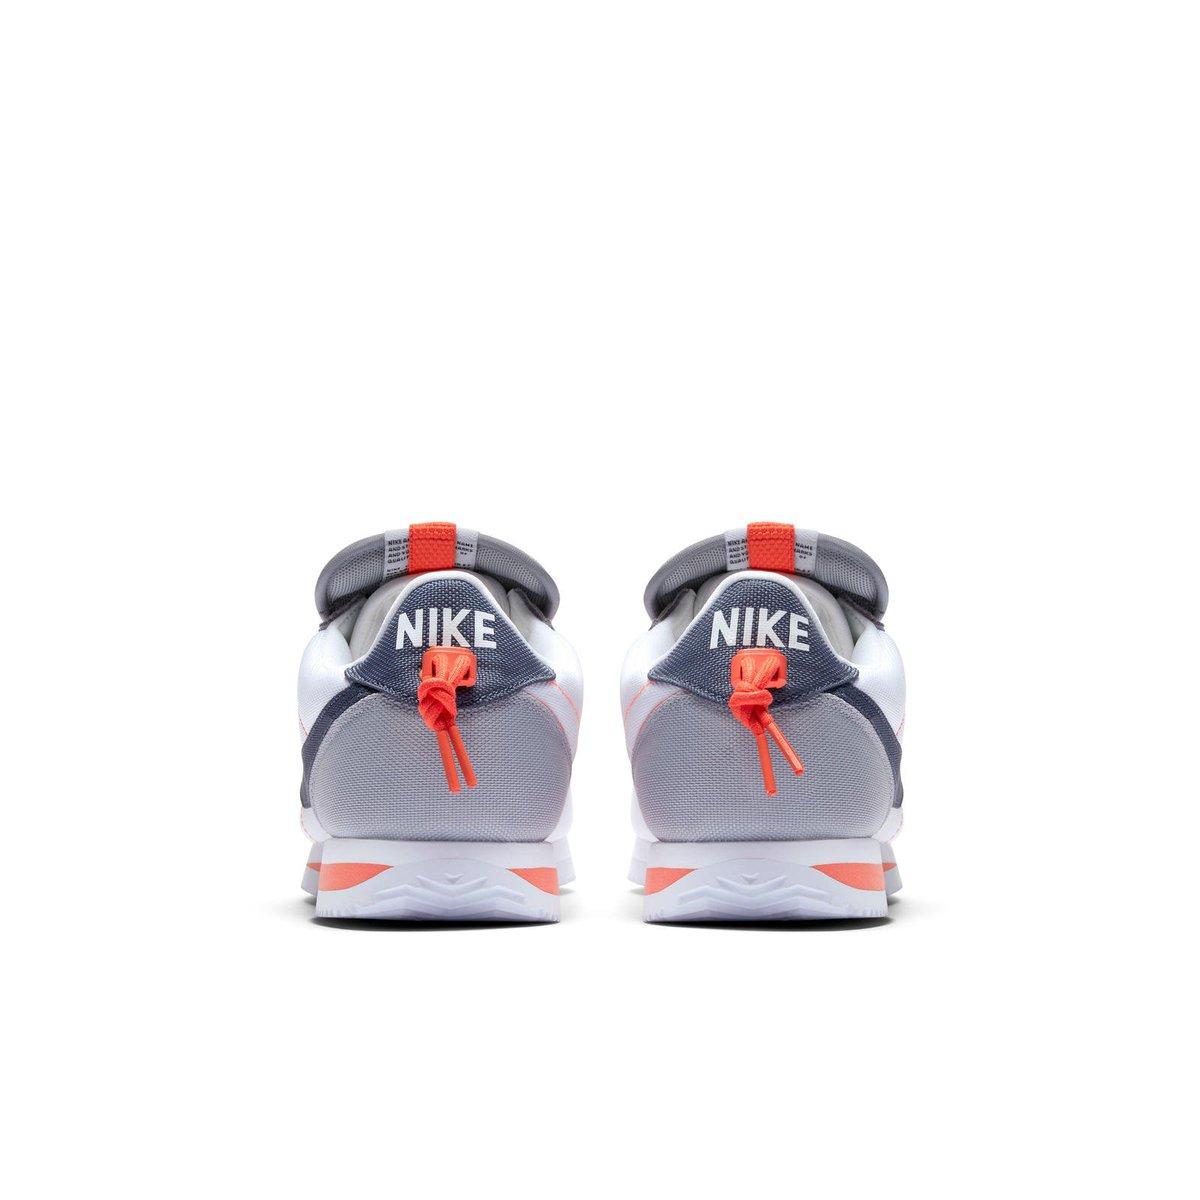 "8221440591993 The  kendricklamar x Nike Cortez Kenny IV ""House Shoe"" releases October 14pic.twitter.com 6eeuegCnMC.  9 05 AM - 11 Oct 2018"